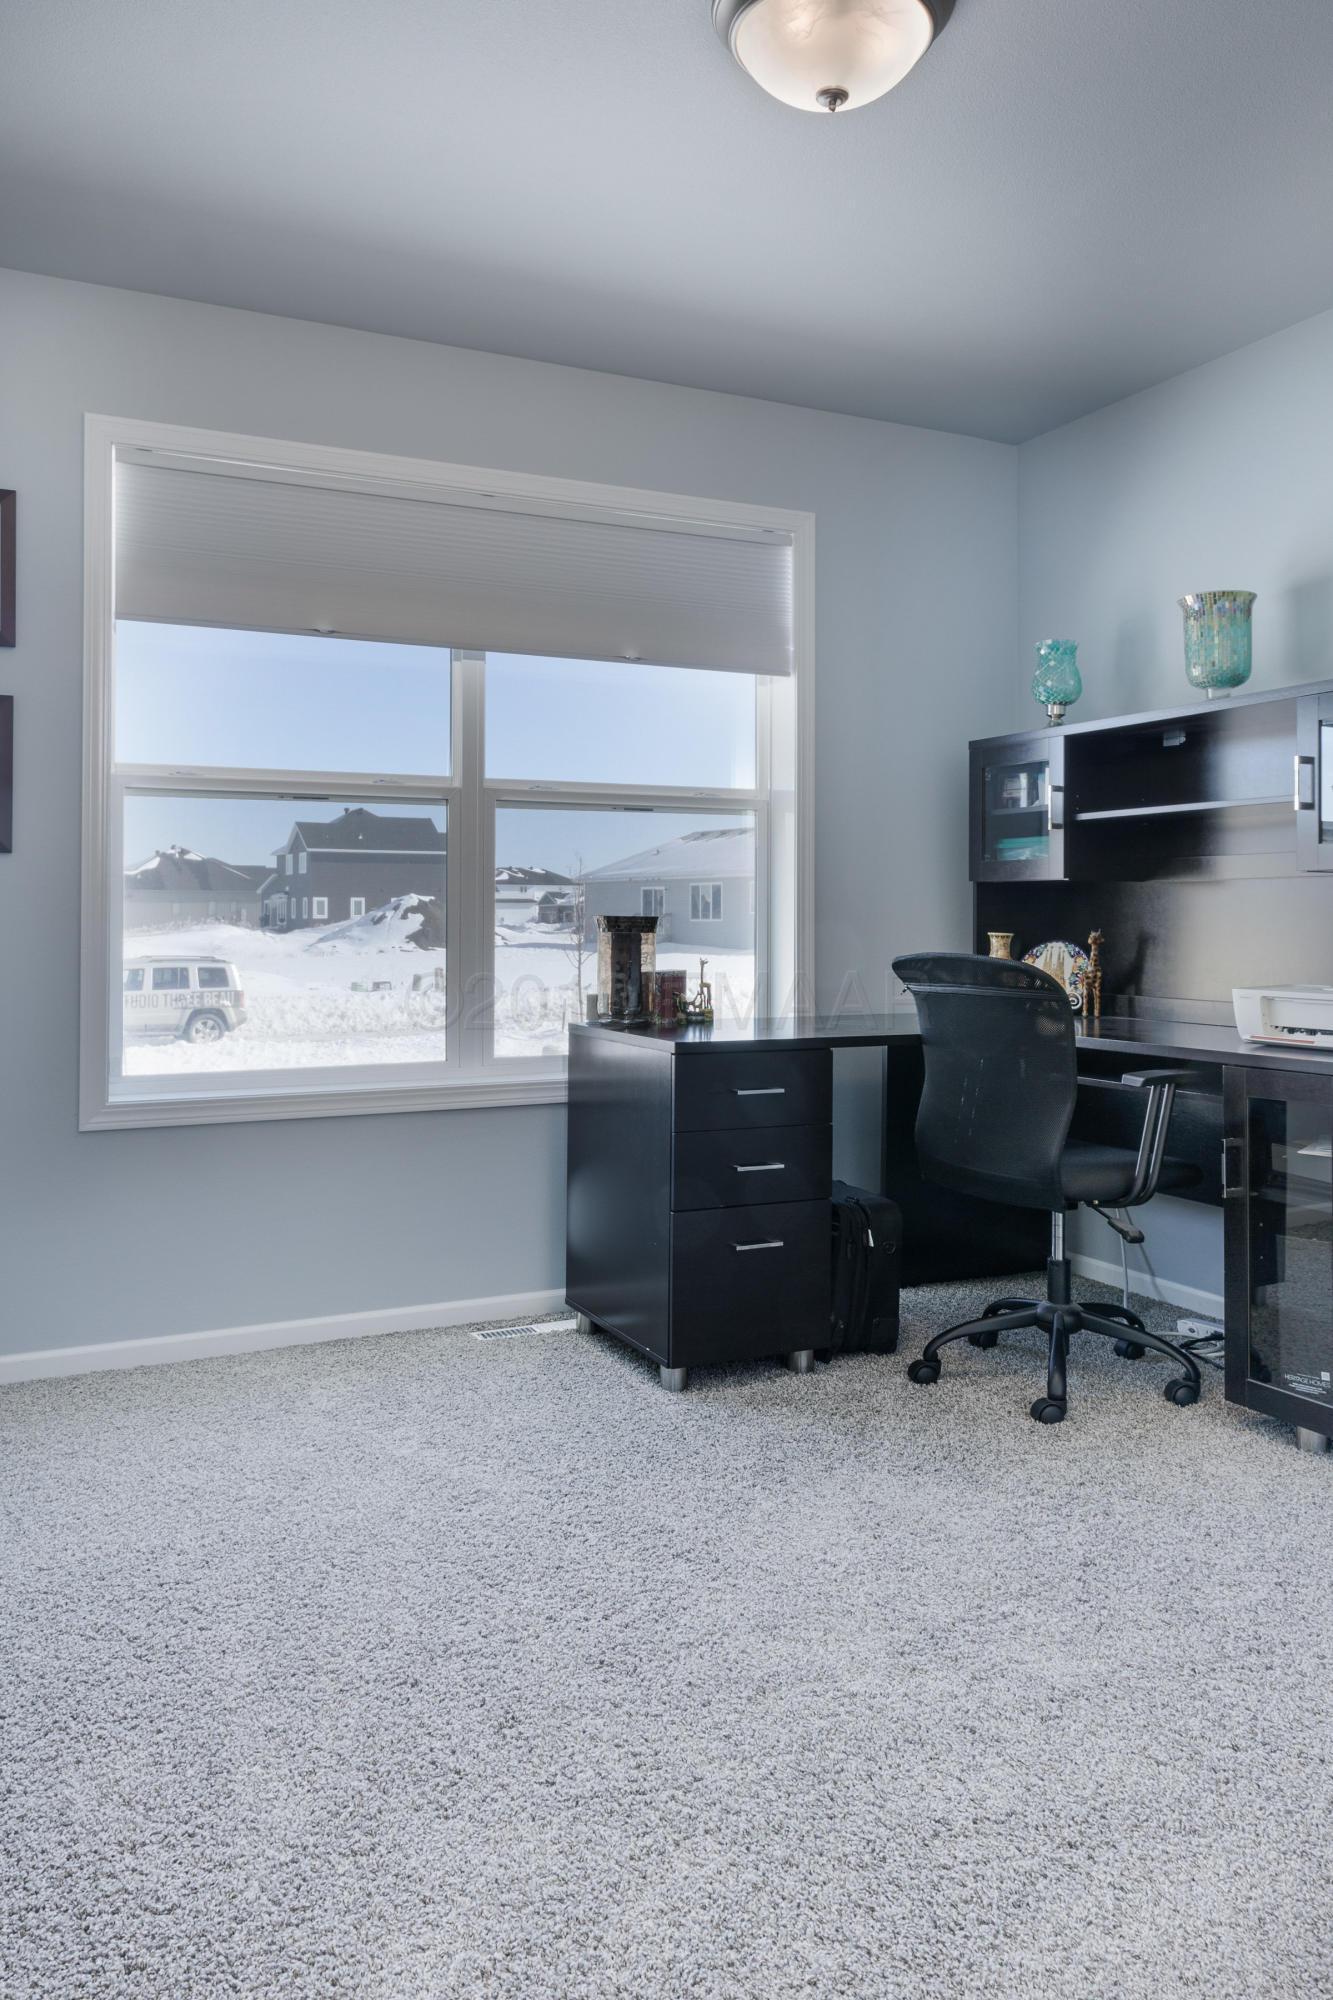 721 48TH Avenue W, West Fargo, ND 58078 - Thomsen Homes